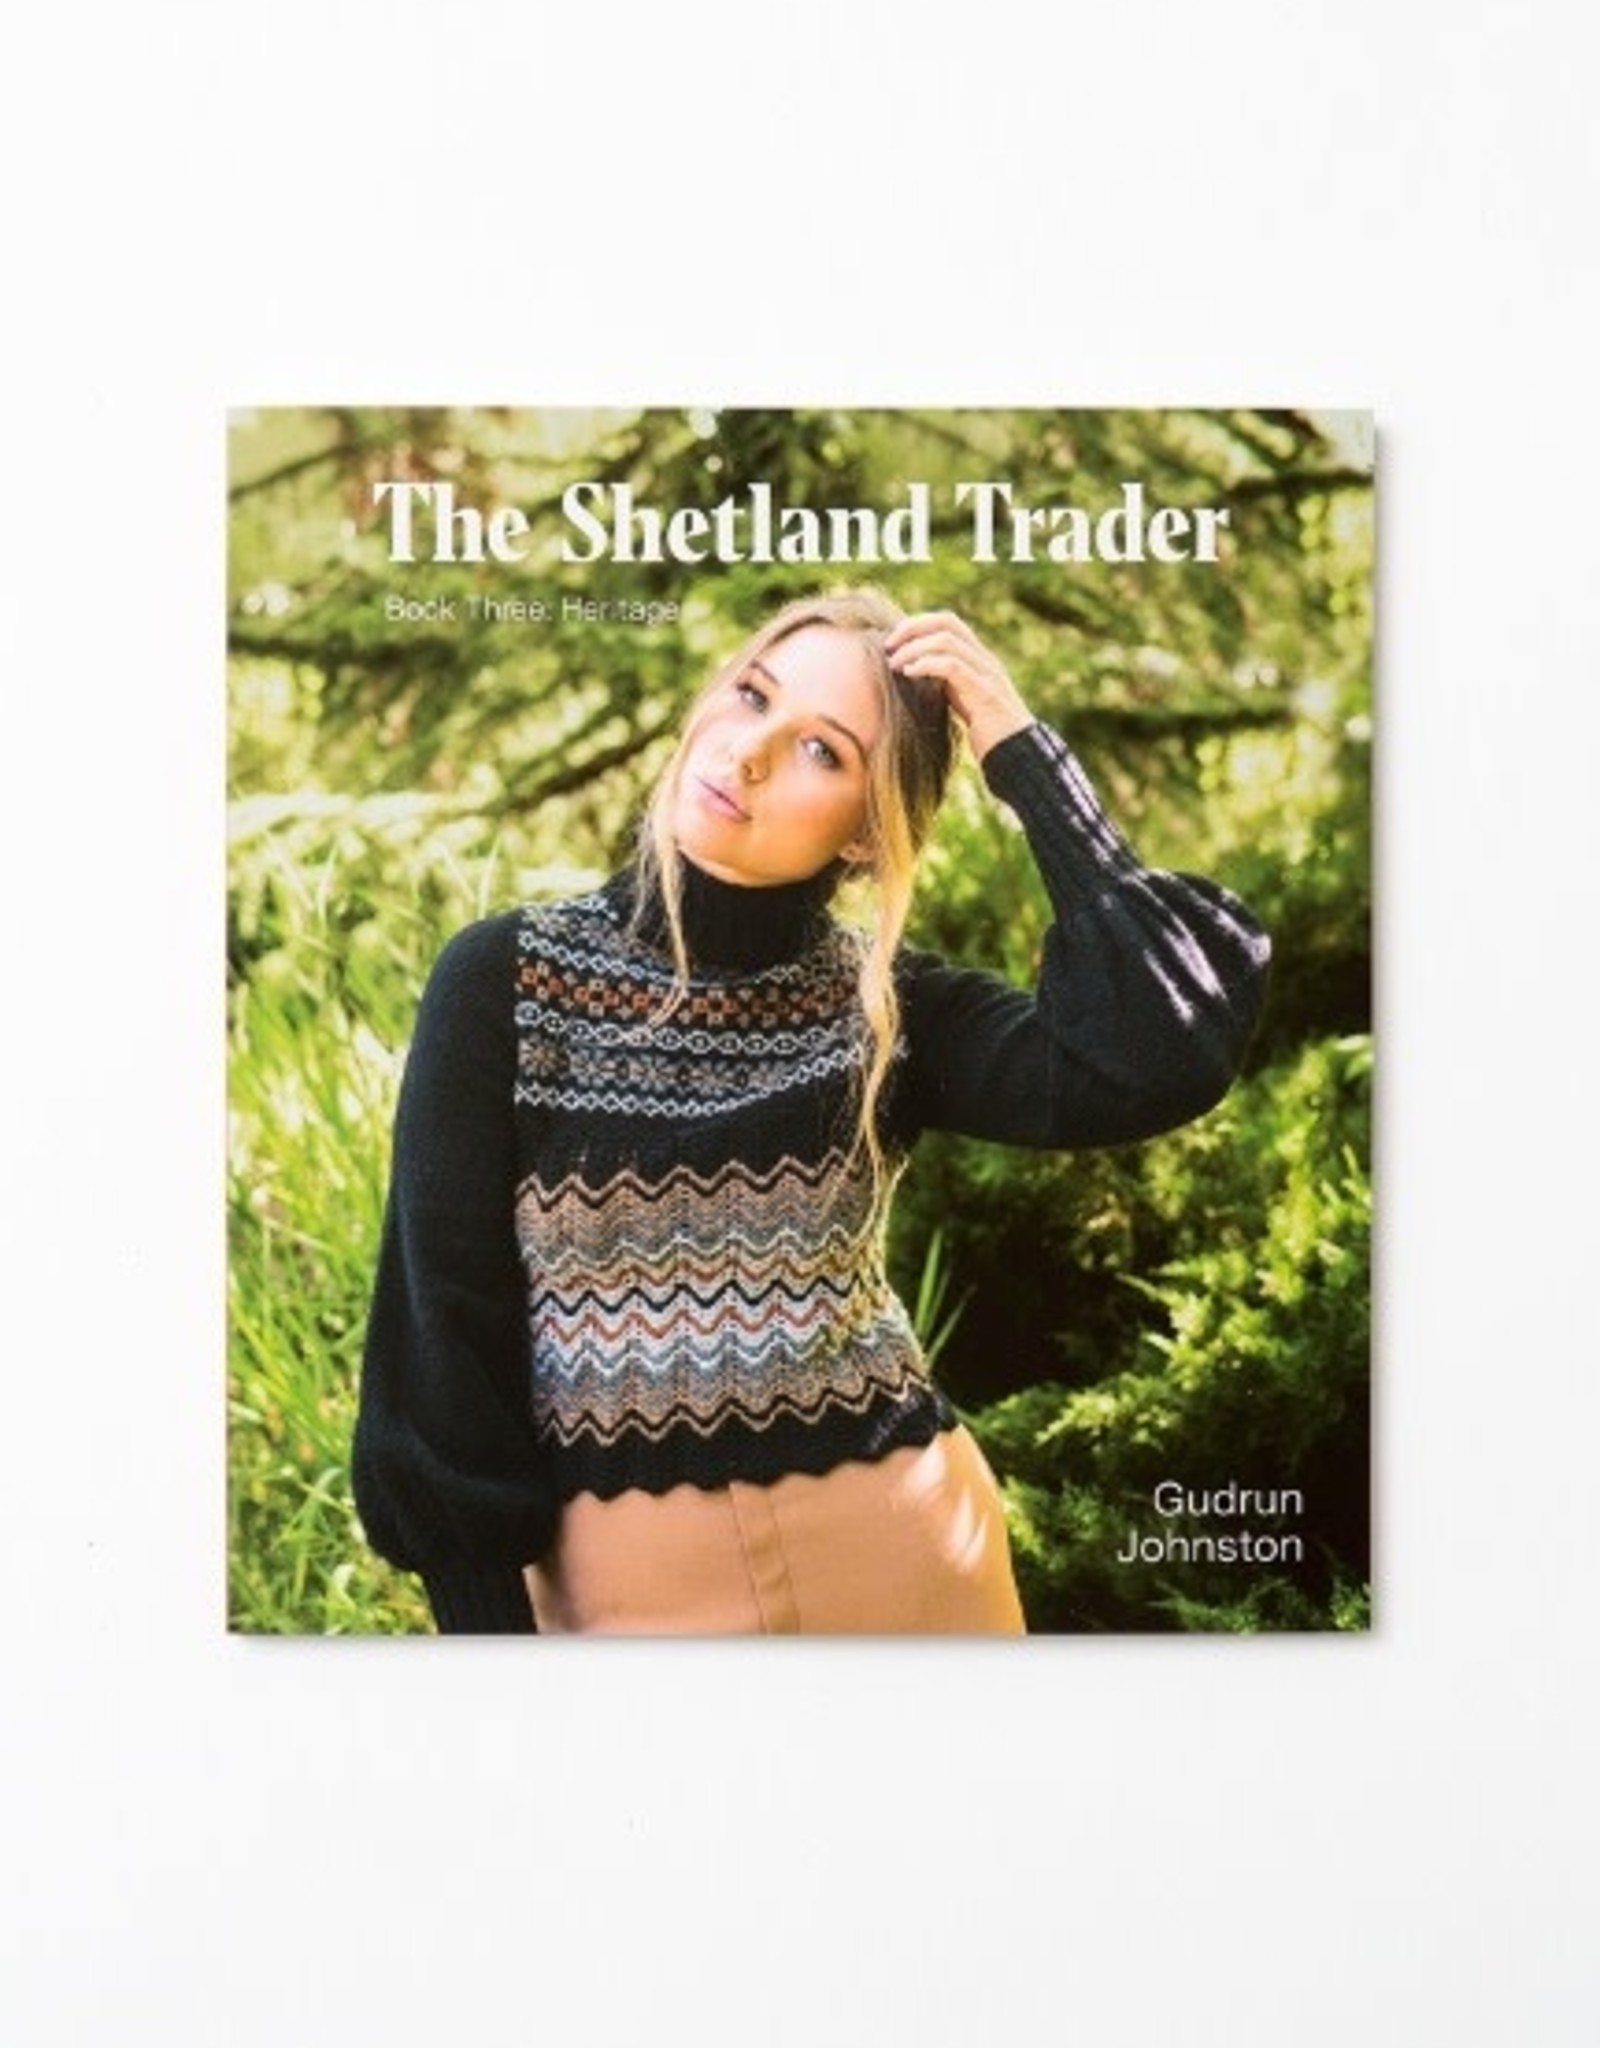 Pompom The Shetland Trader Book 3